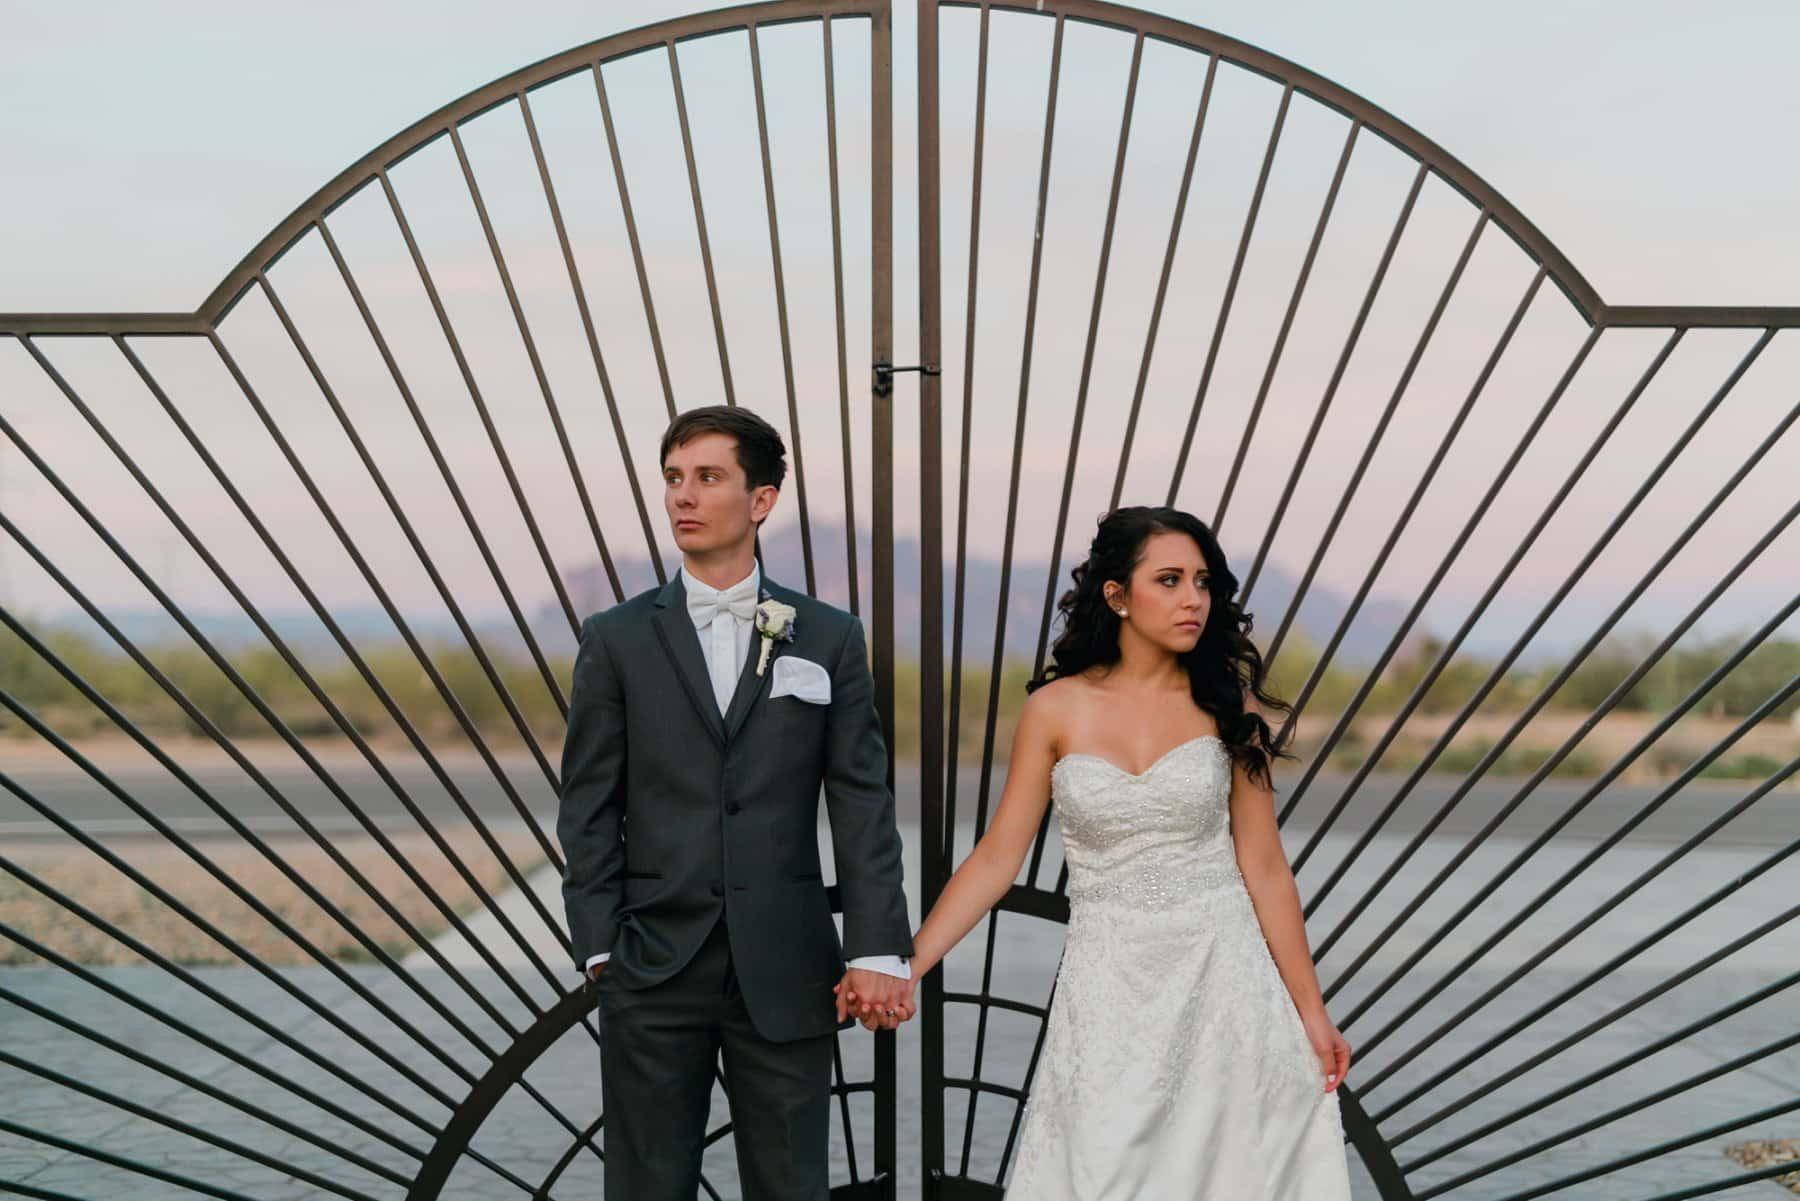 Superstition Manor wedding photos